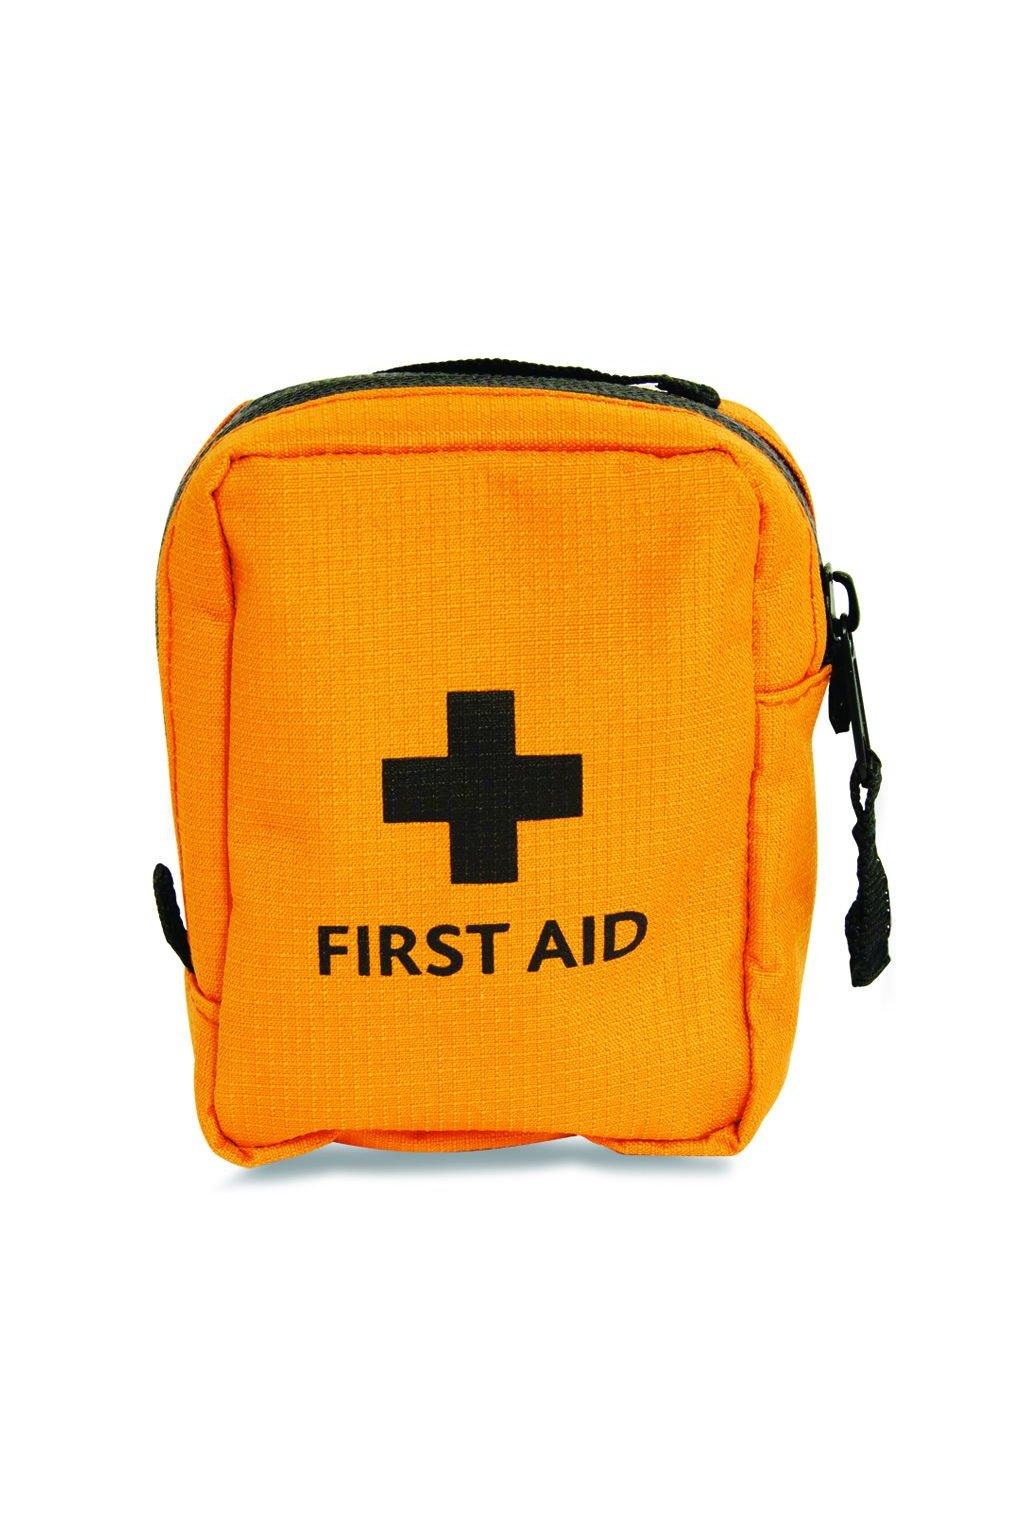 thfa01 first aid kit